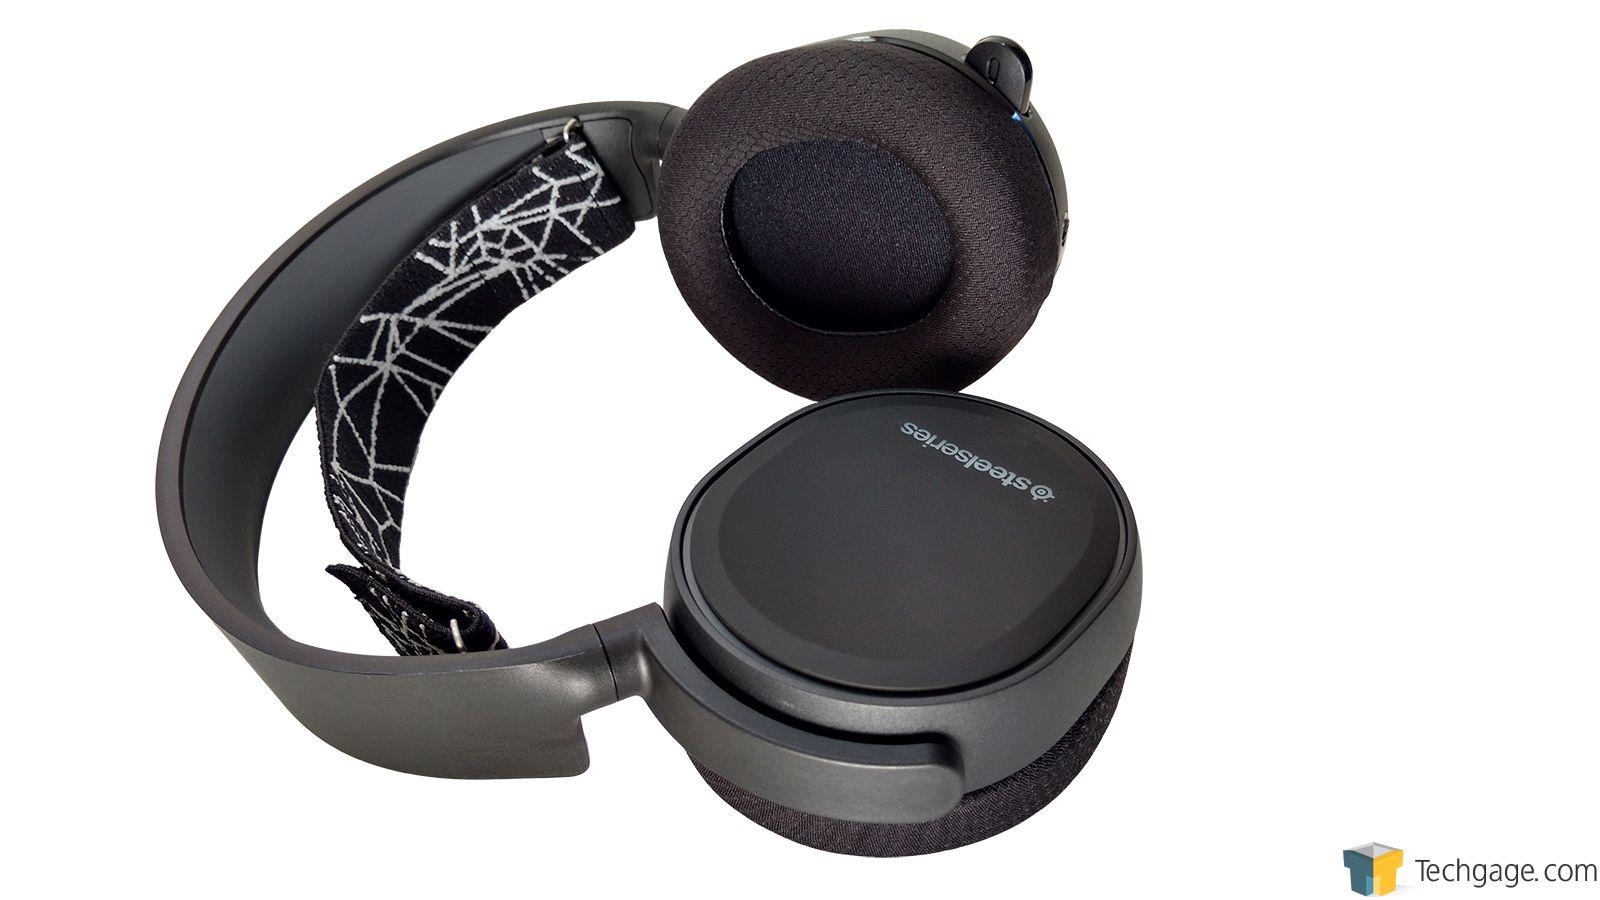 steelseries arctis 5 7 1 surround sound rgb headset review. Black Bedroom Furniture Sets. Home Design Ideas